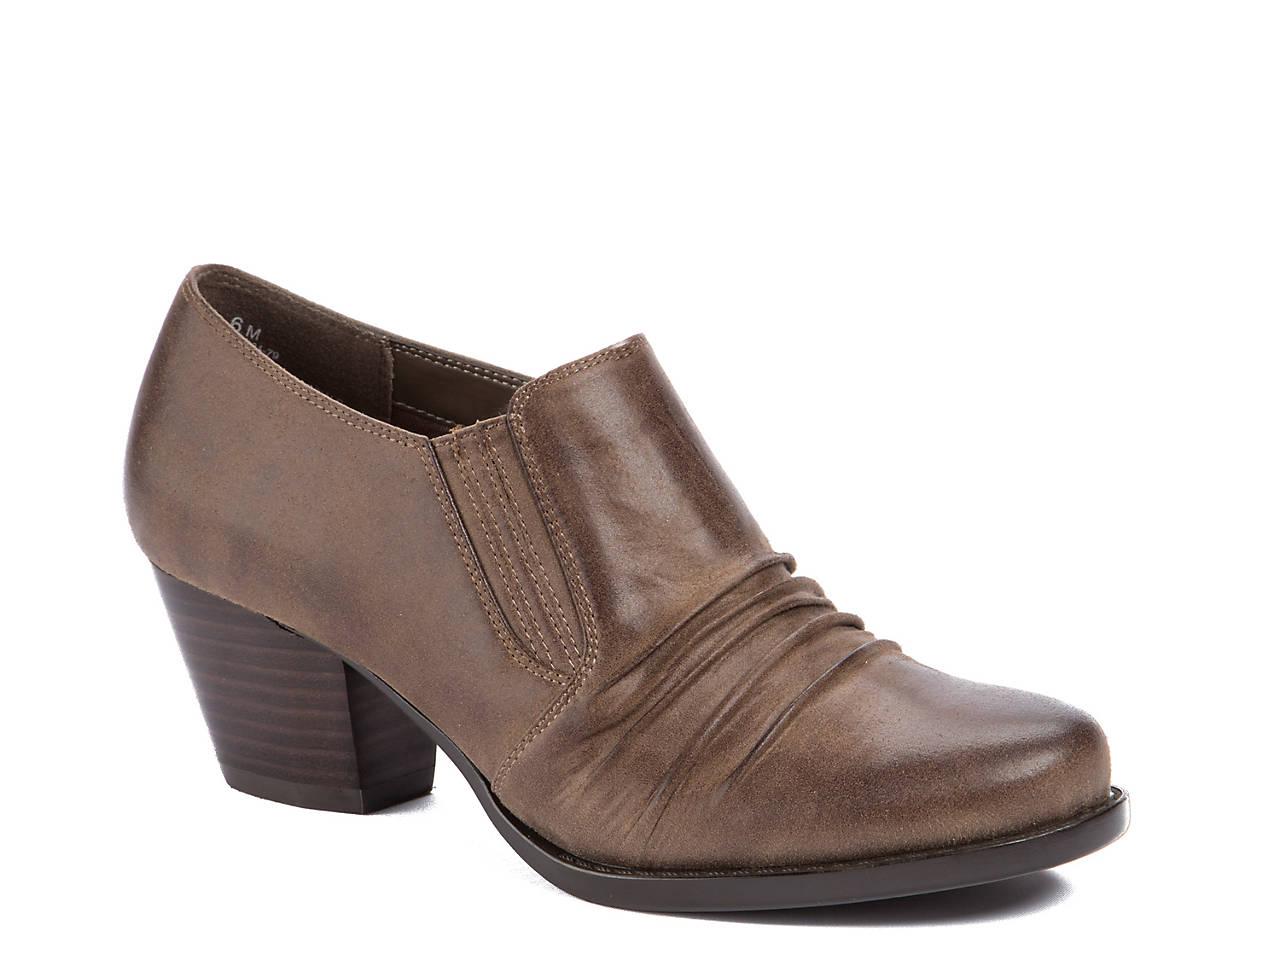 Women's BareTraps Reagen Shoes 2015 new online eastbay online clearance cheapest price discount best wholesale outlet 2014 unisex BA1gxV